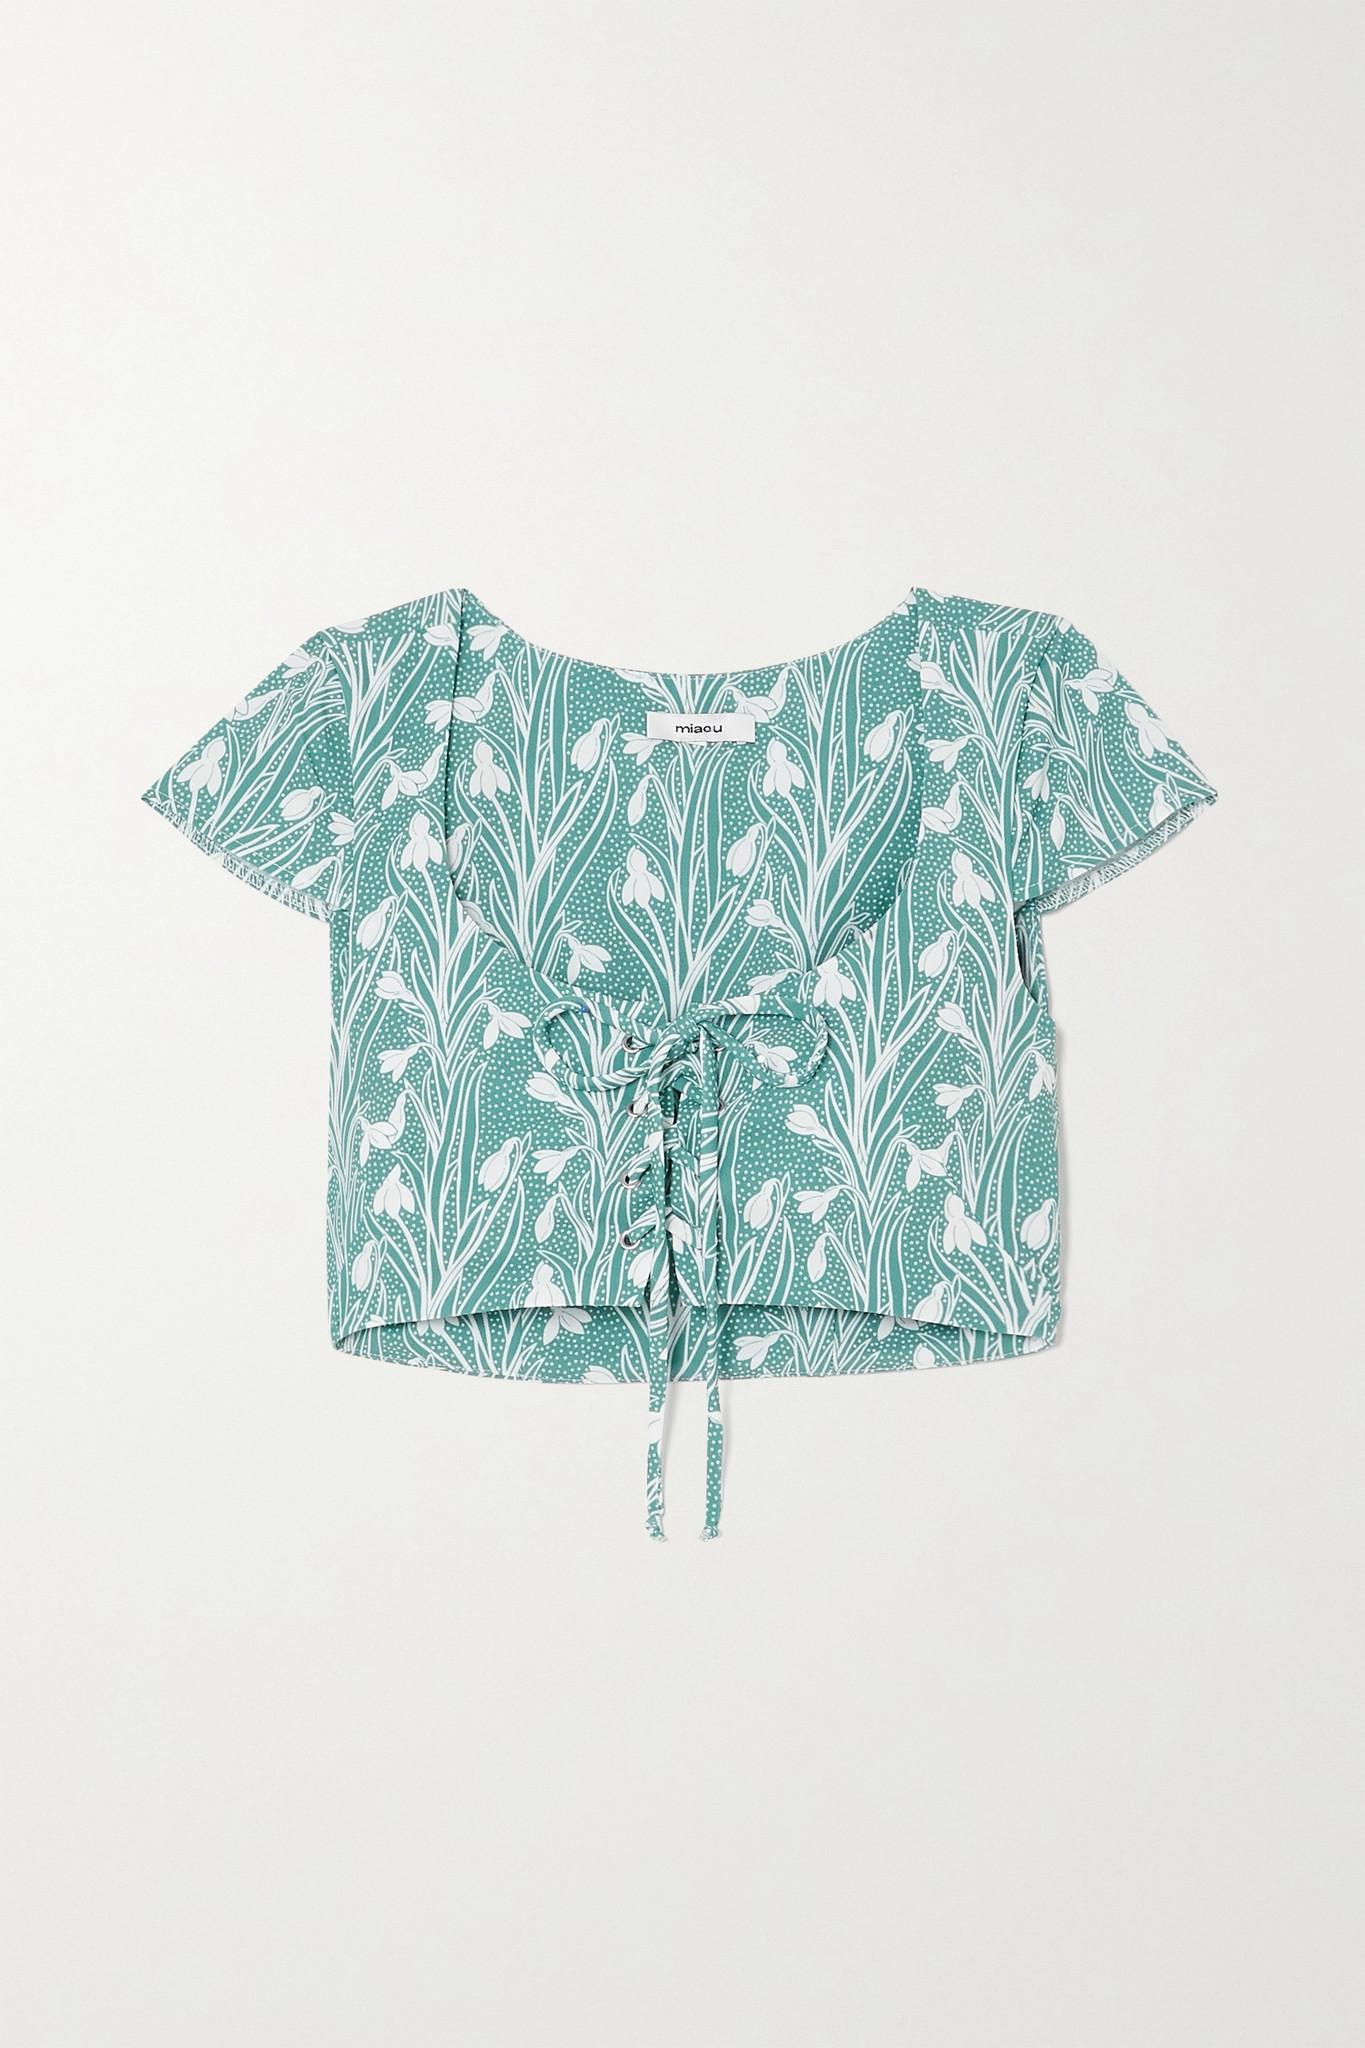 MIAOU - 【net Sustain】arielle 绑带式花卉印花弹力绉纱短款上衣 - 绿色 - large